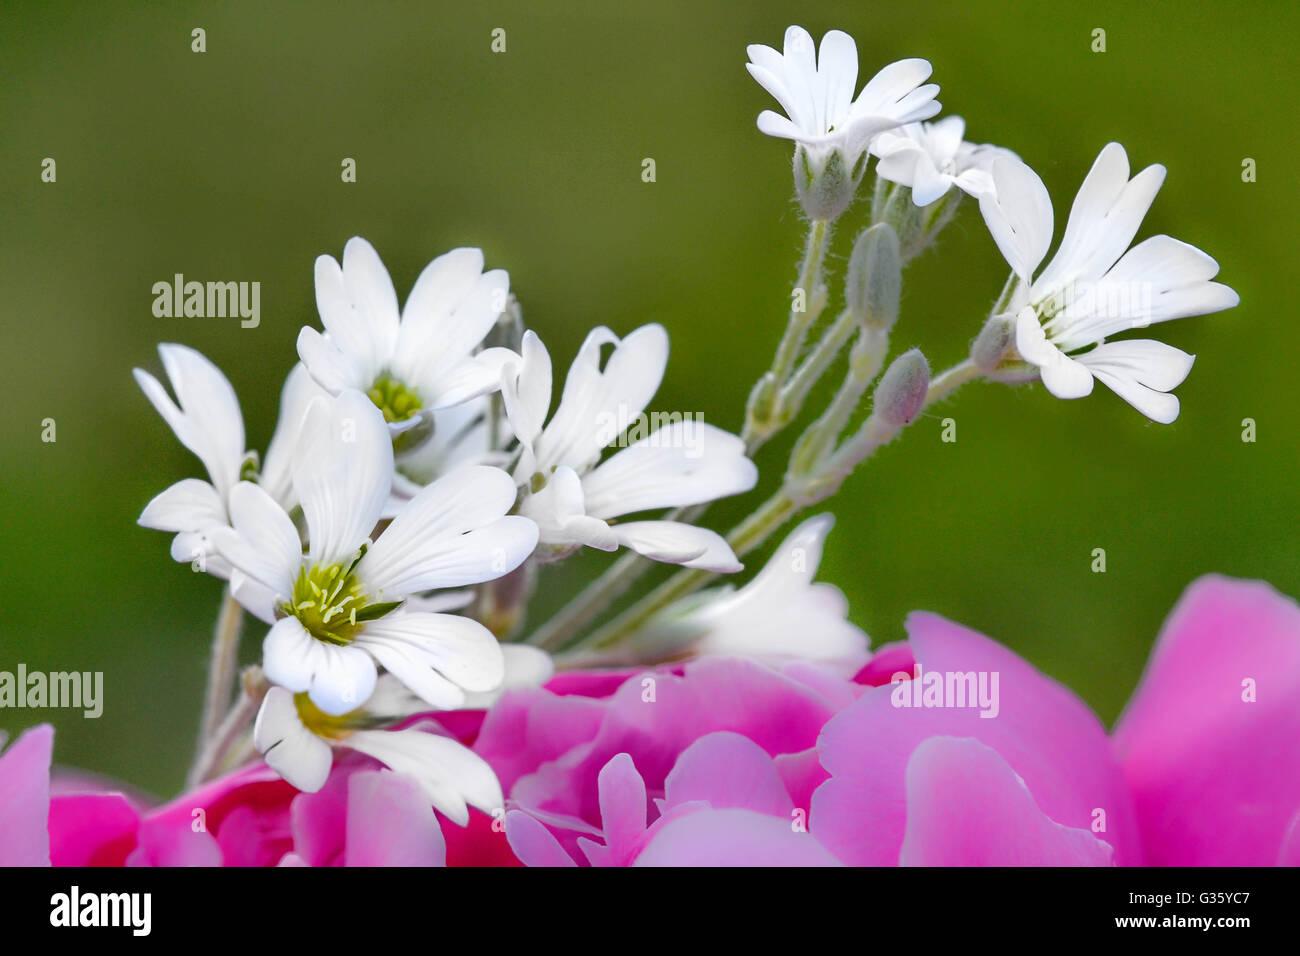 Jana kuusik, flower, white, pink, colour, , decor, flower art, abstract - Stock Image